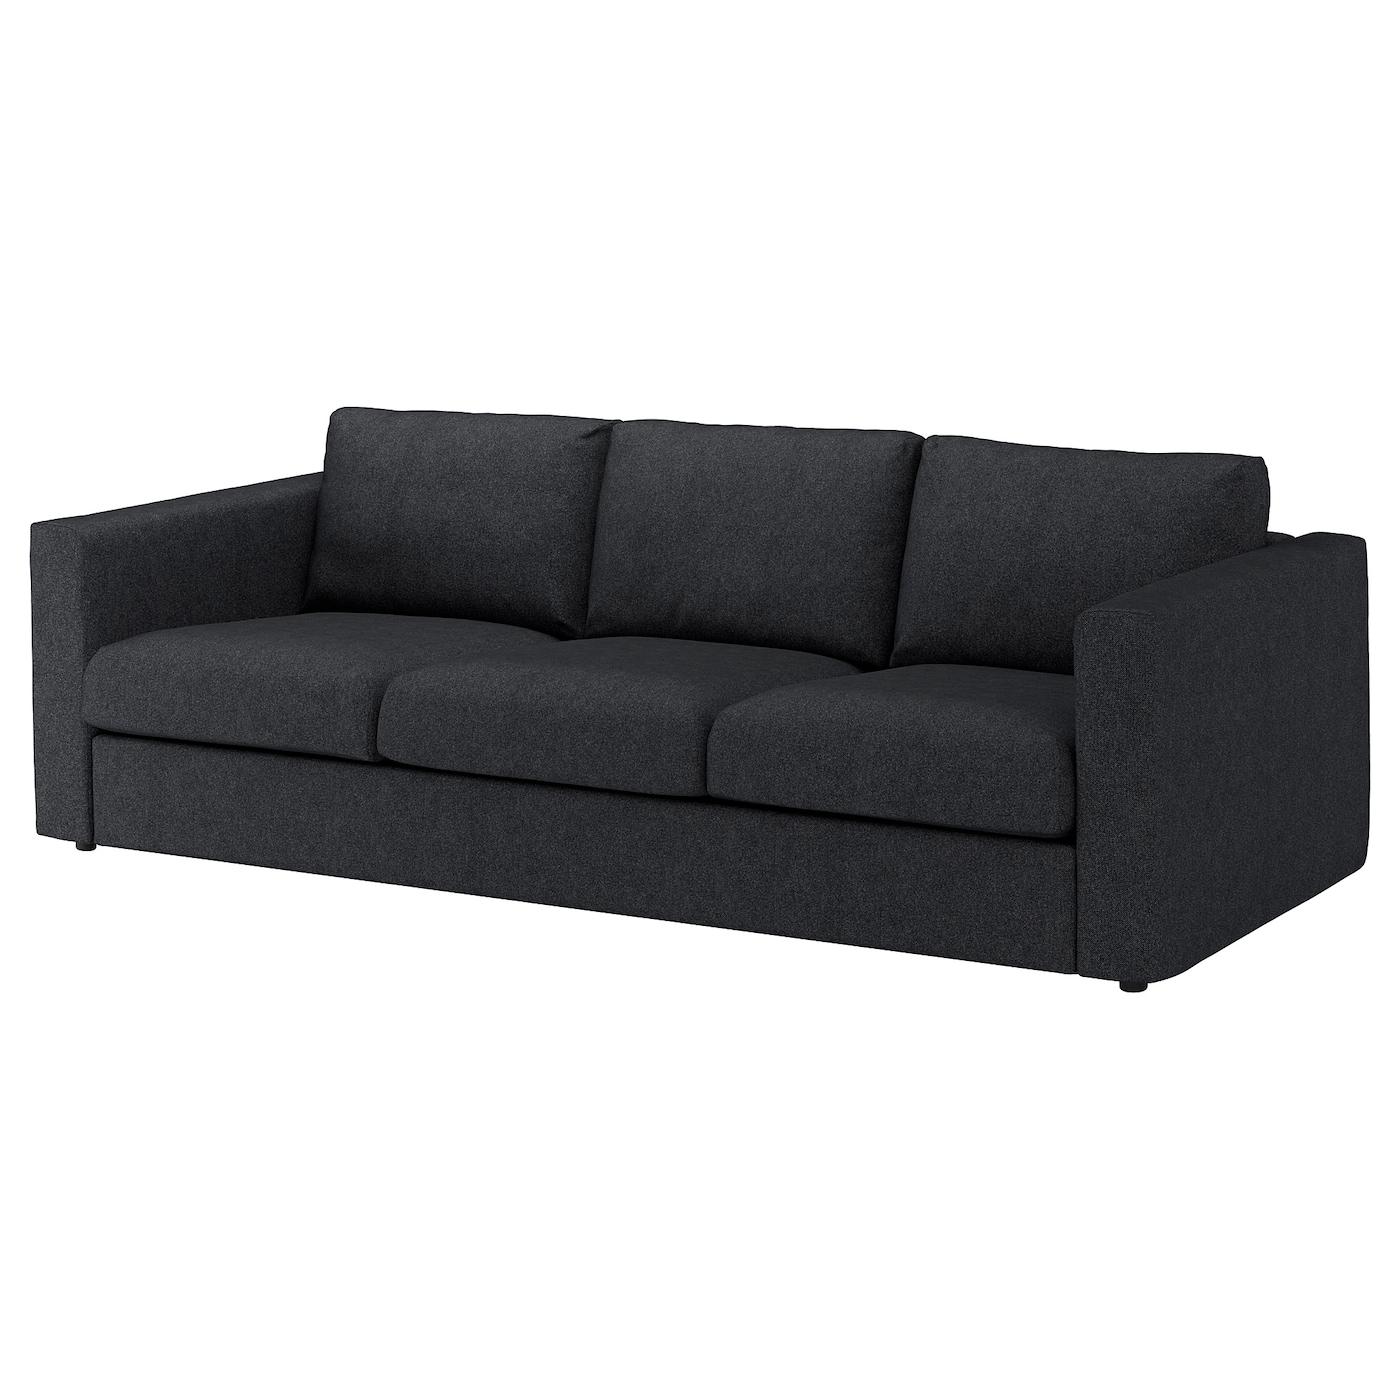 IKEA VIMLE Sofa 3-osobowa, Tallmyra czarny/szary